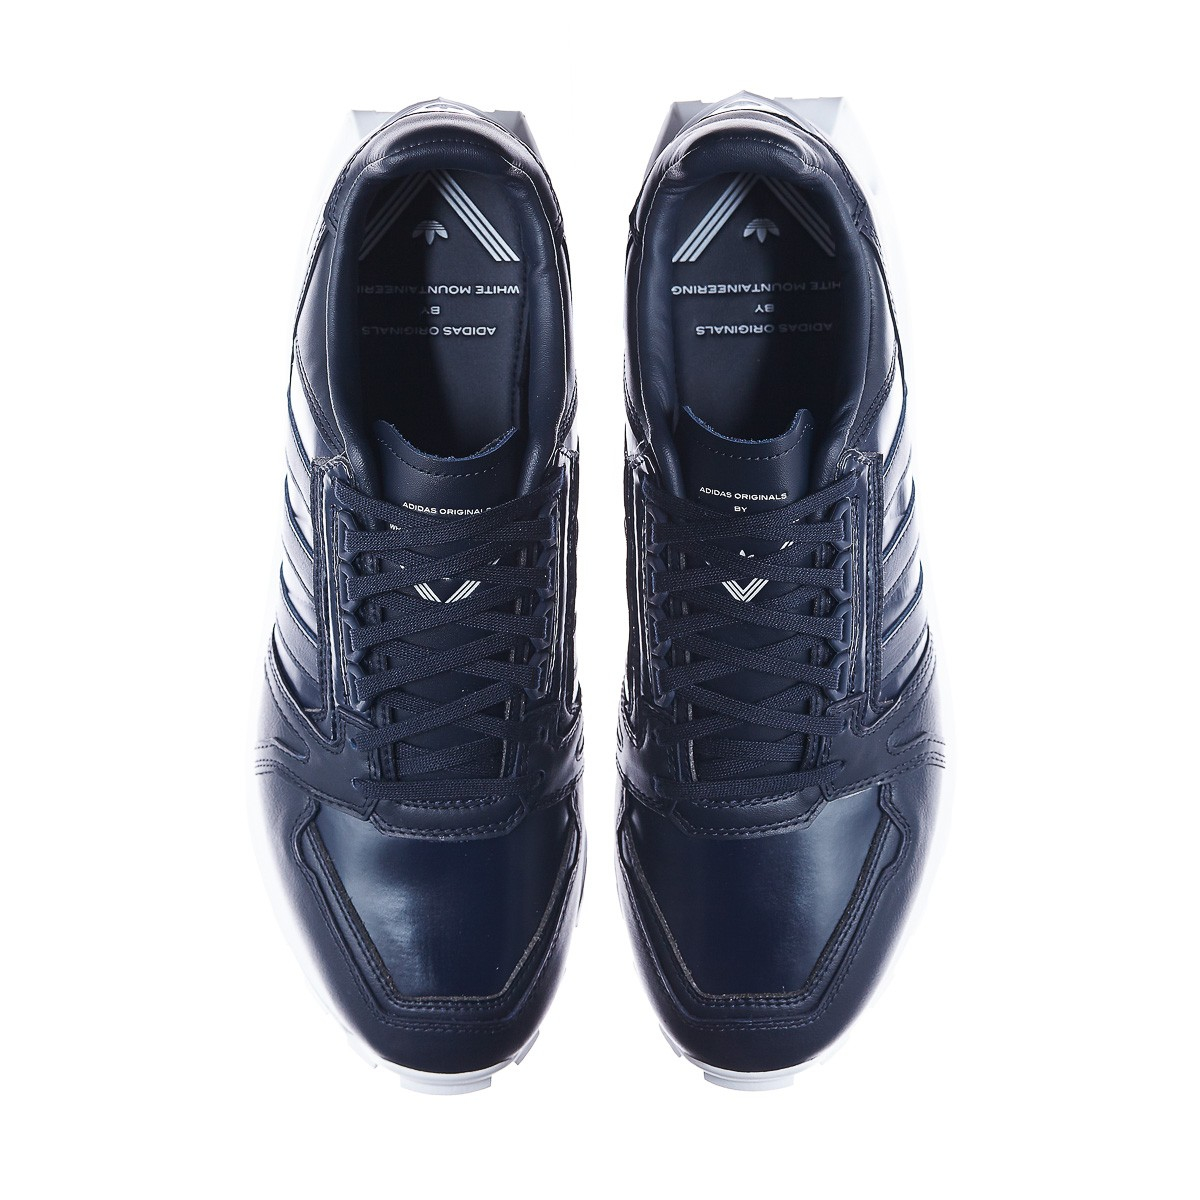 3fedde2e0e94 ... Lyst - Adidas Originals White Mountaineering Formel 1 Sneake outlet  598bf dffd1  adidas originalsМужские кроссовки x ...